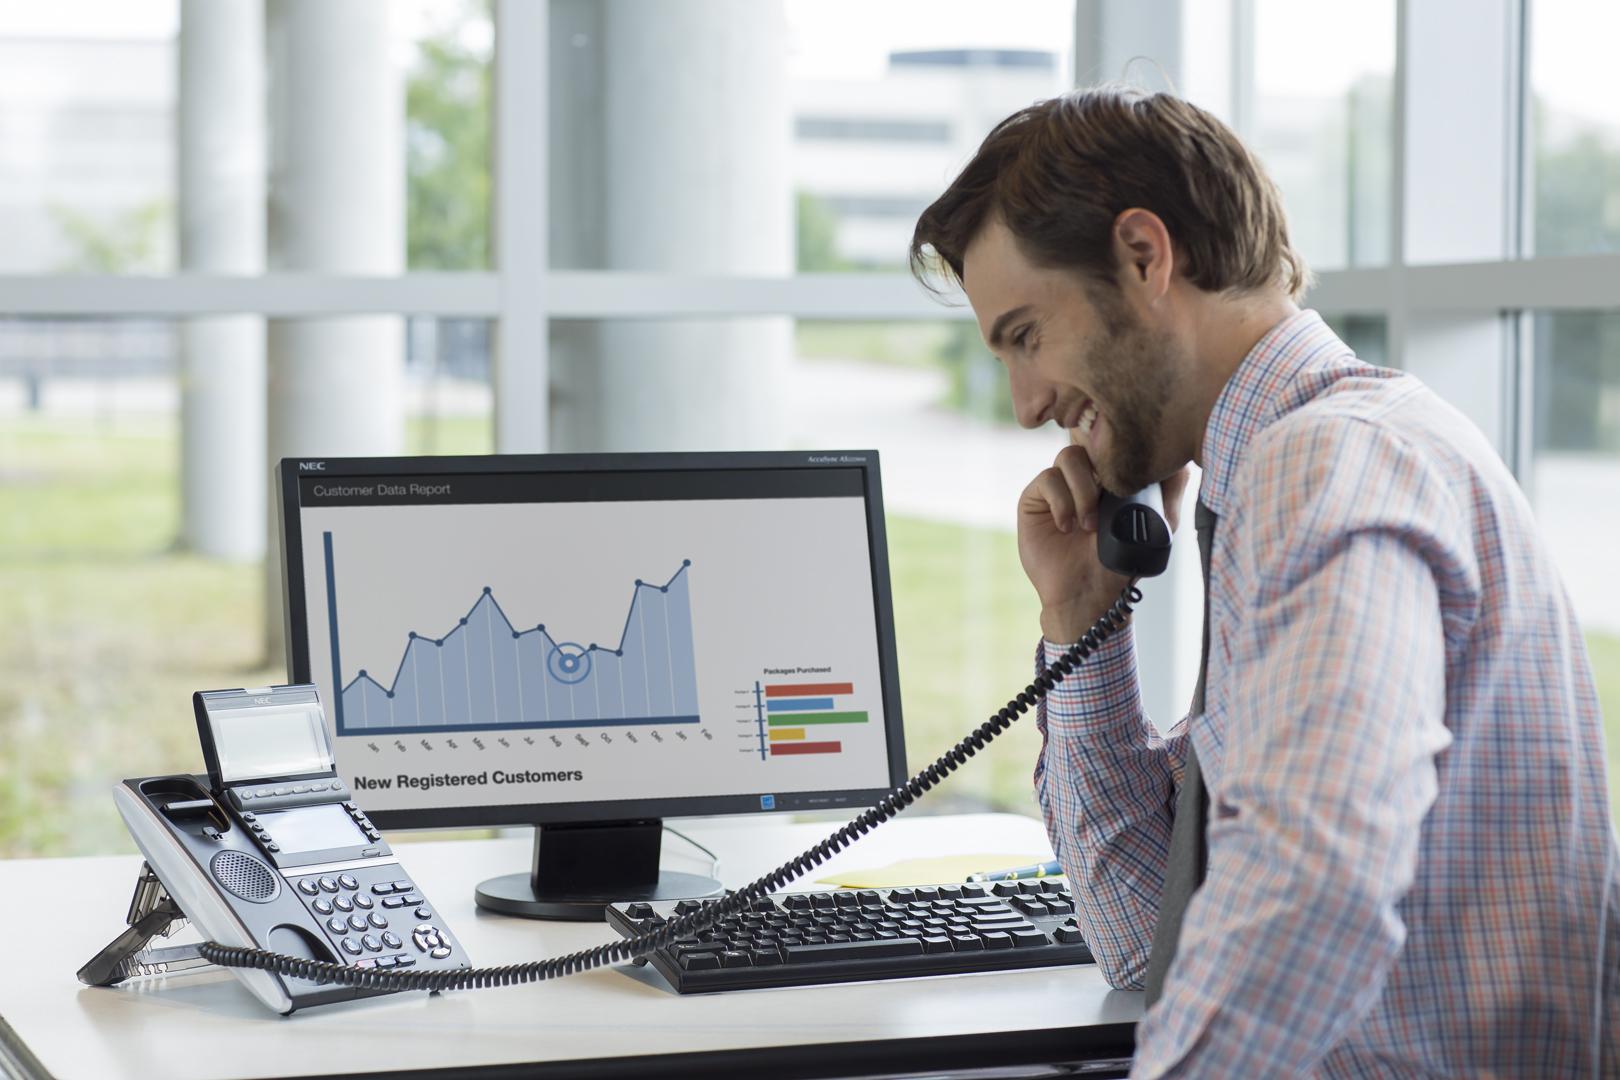 Get the full potential of IBM Cognos Analytics